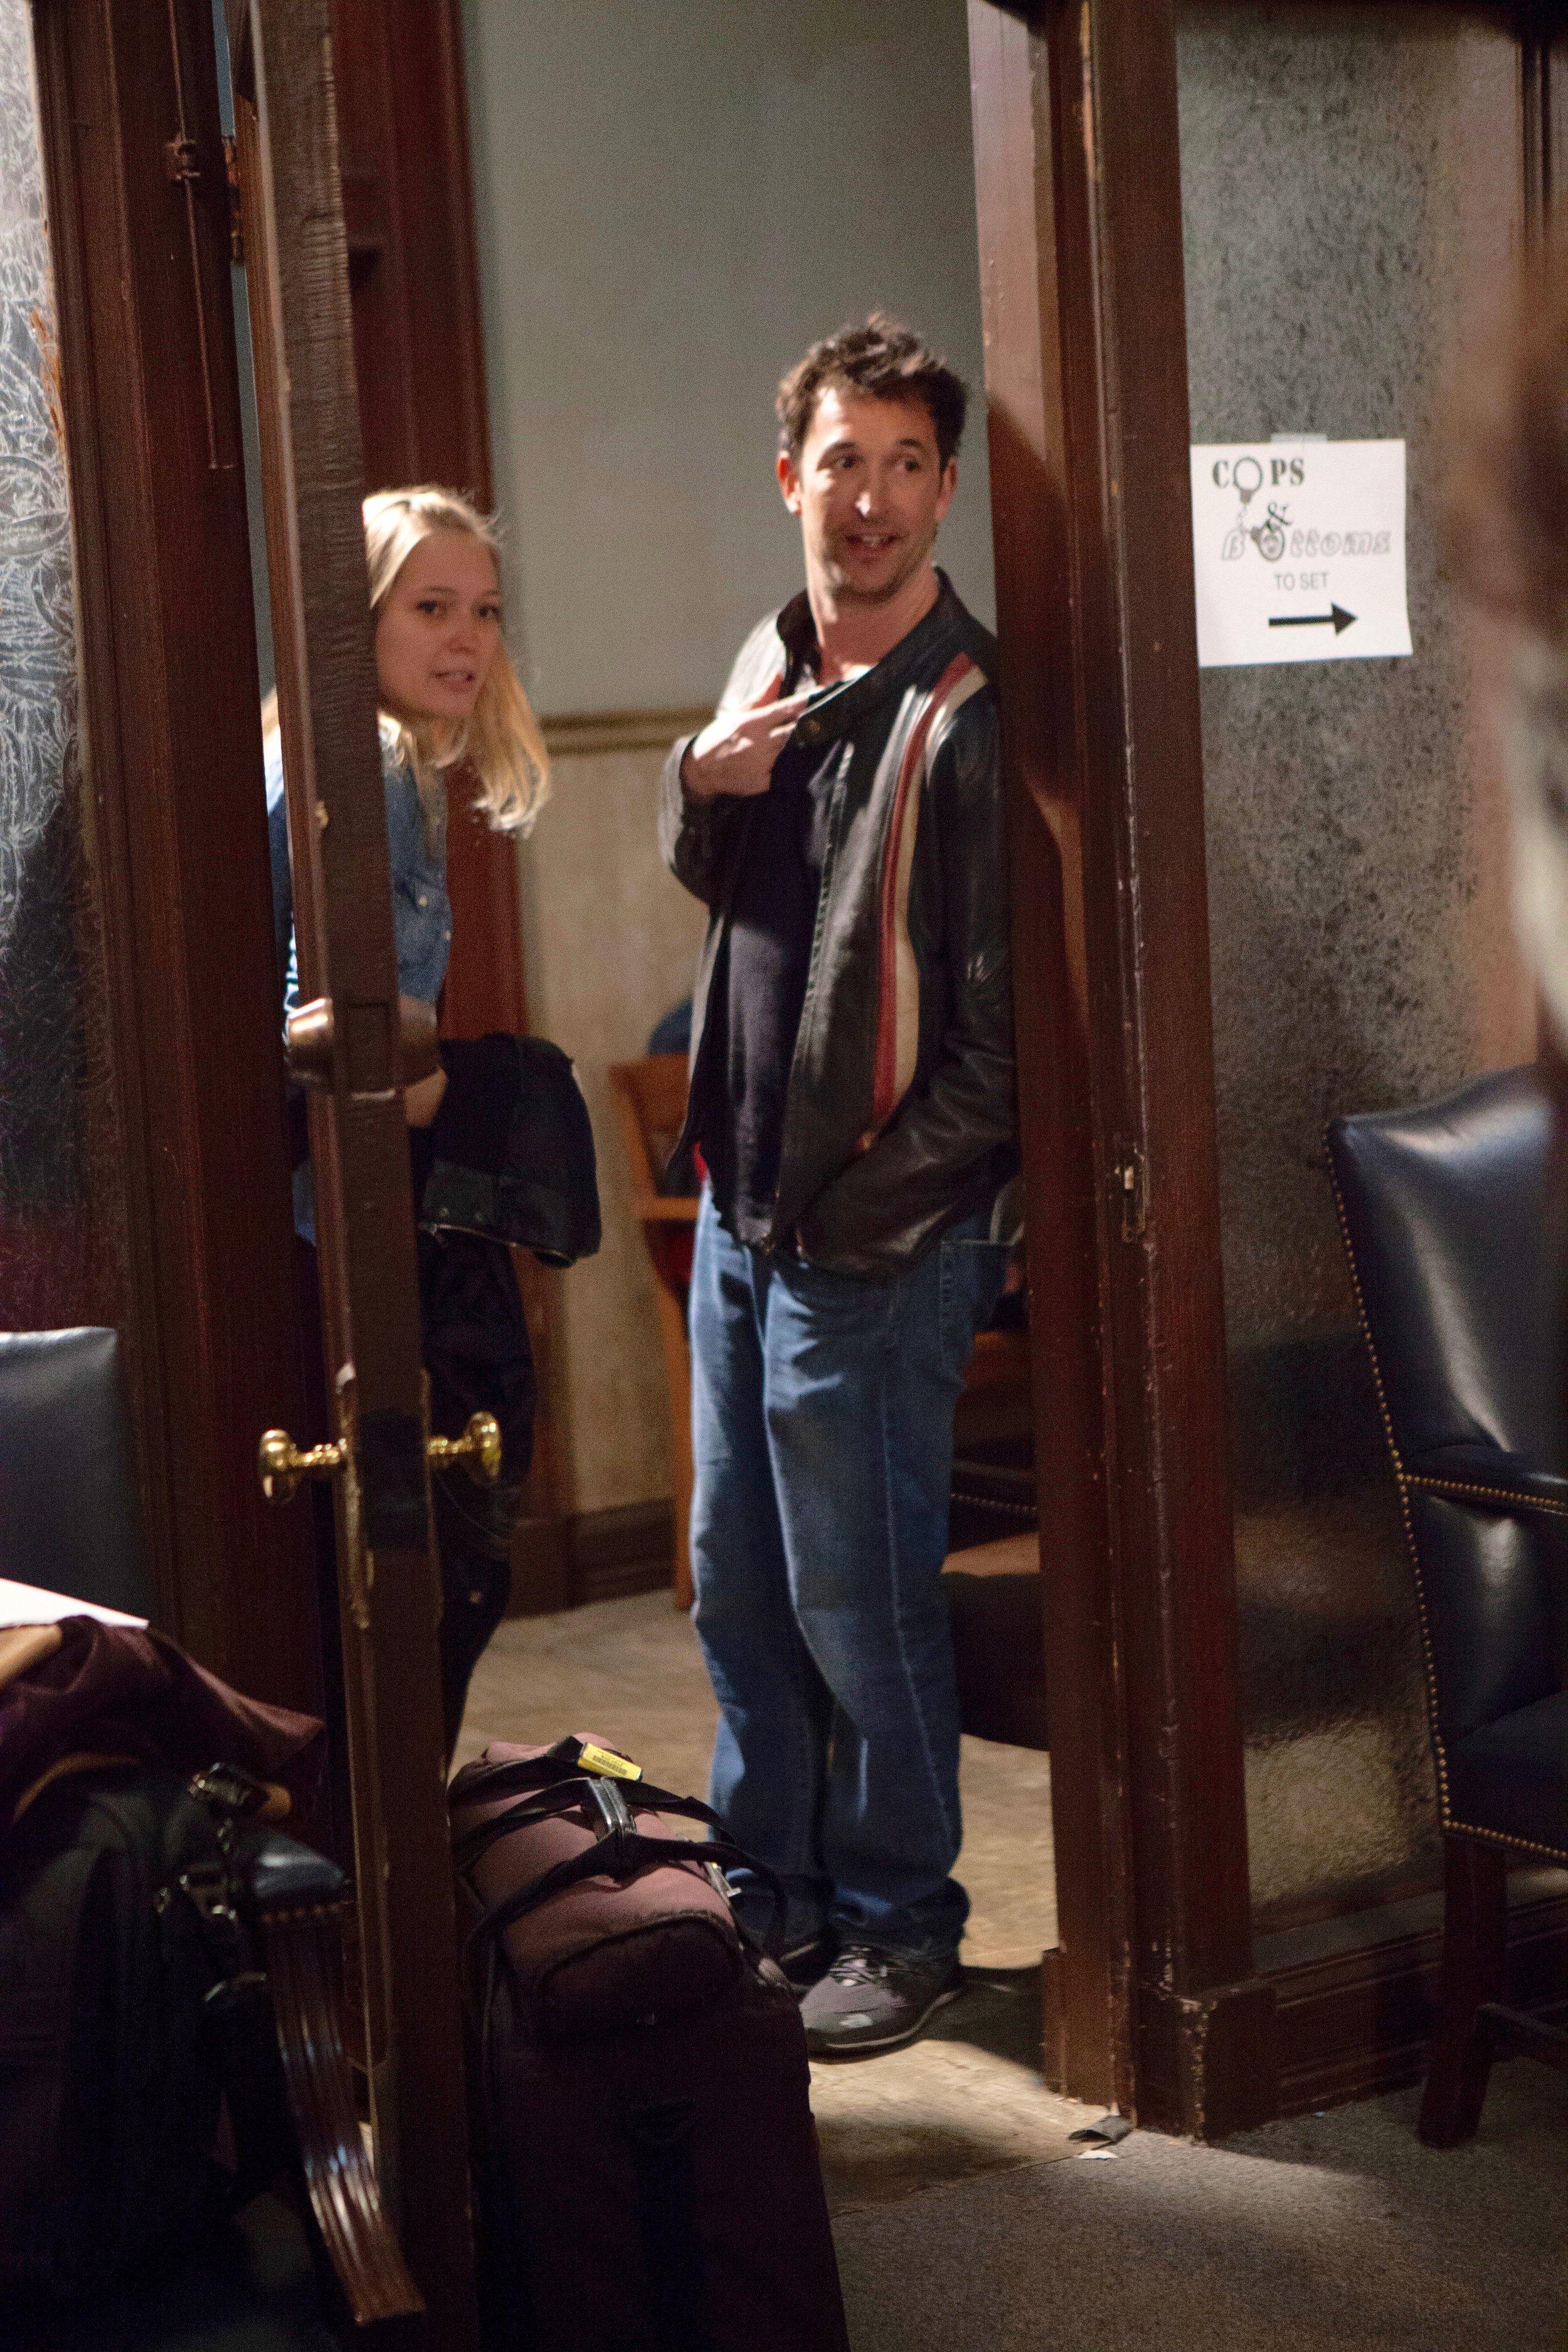 "1/16/16 Cops & Bottoms Production Office Scene. L to R: Britt Harris (""Prod. Ass.""), Noah Wyle (""Noah"")"